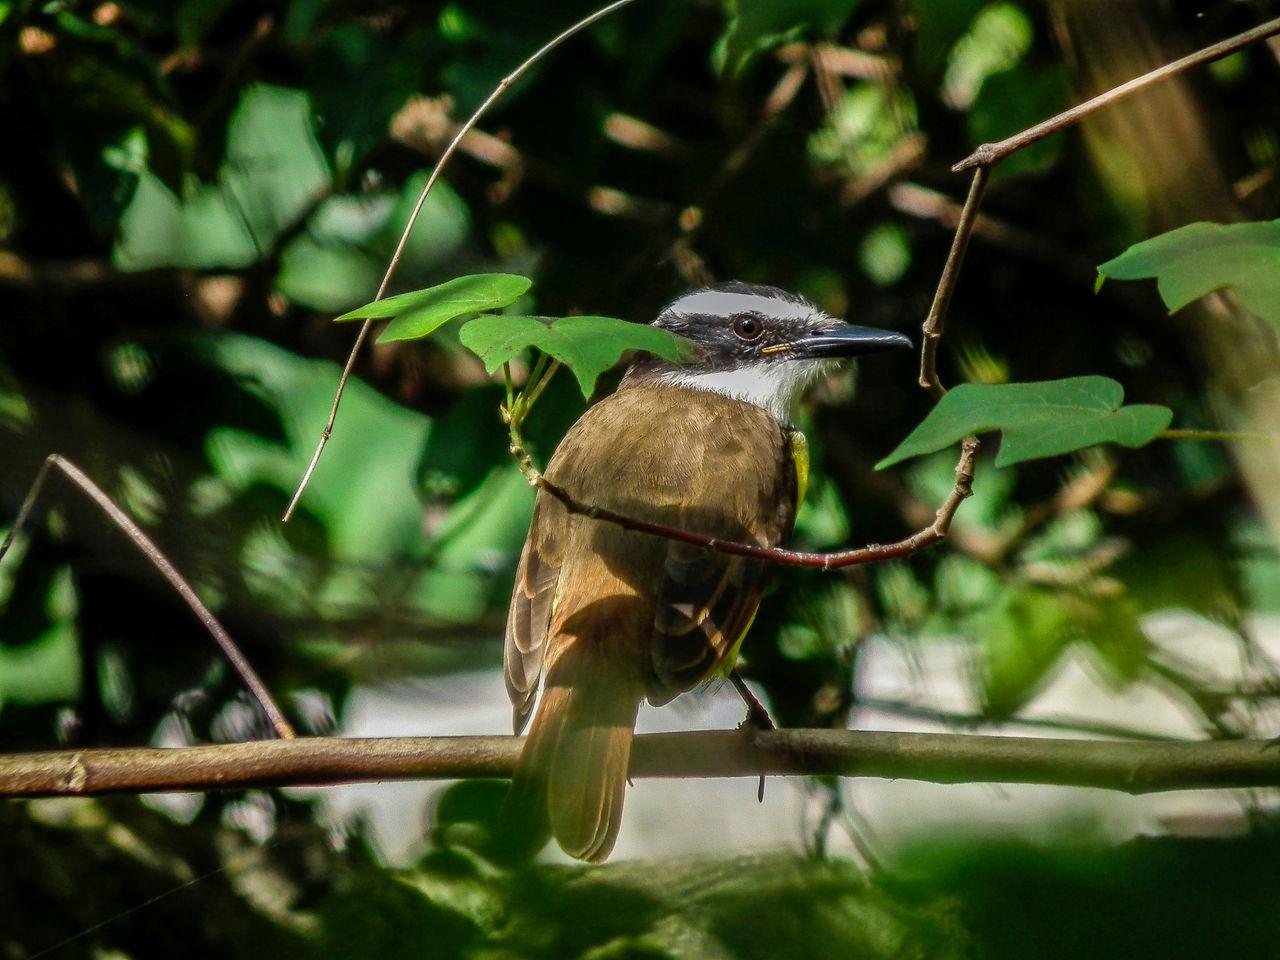 Great Kiskadee - Pitangus sulphuratus Bird Birdwatching Branch Day Great Kiskadee Nature Perching Pitangus Sulphuratus Wildlife Yucatan Mexico Yucatan Peninsula Yúcatan Zoology